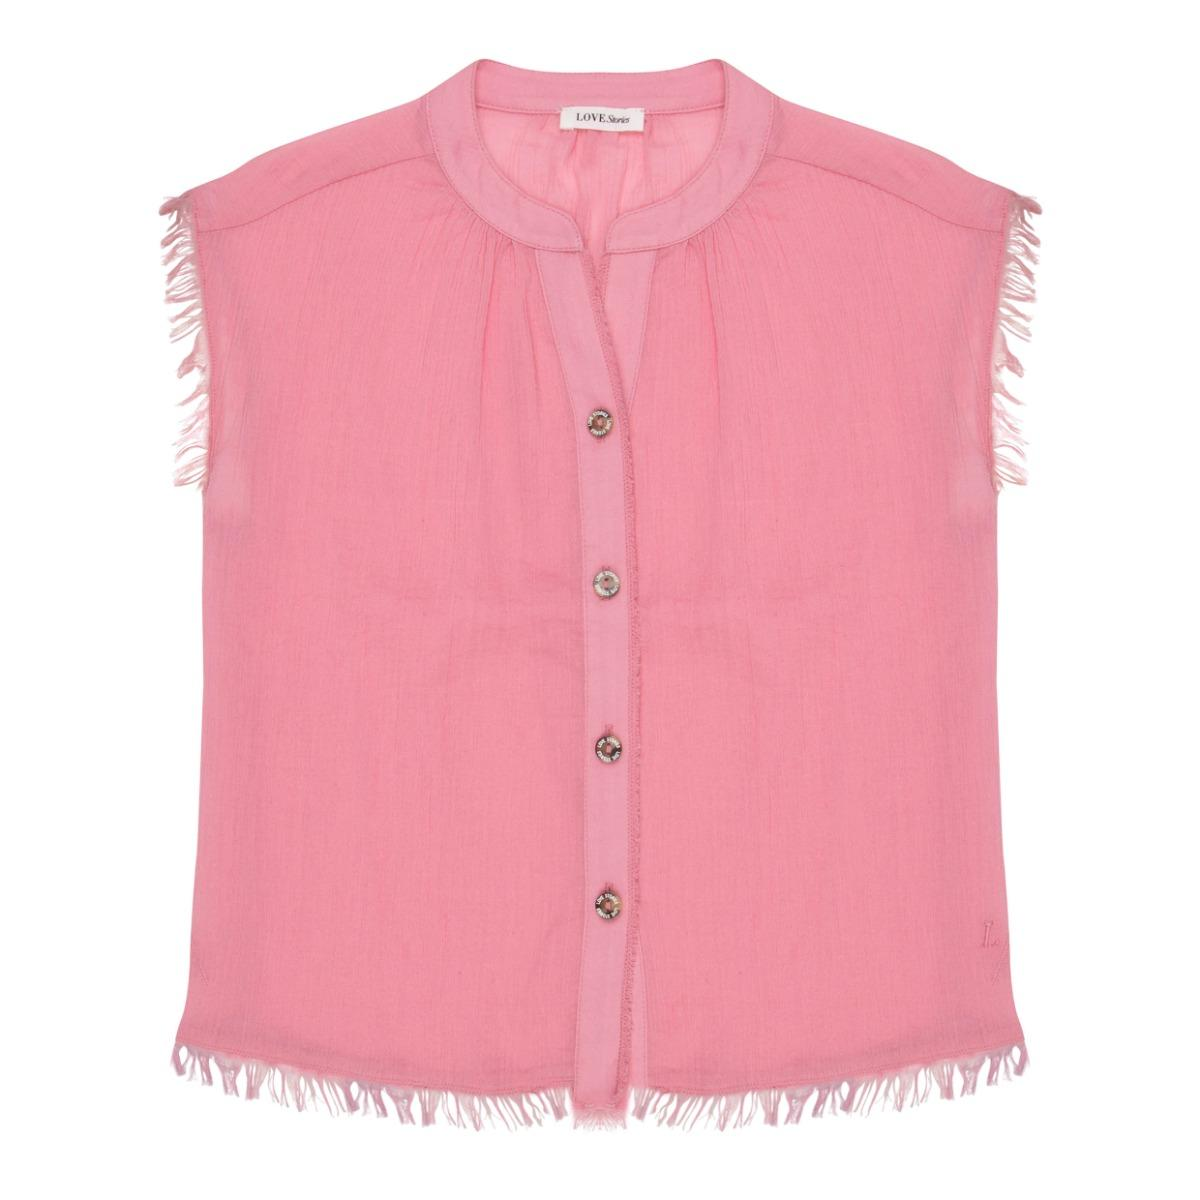 Love stories Pia Mini Shirt